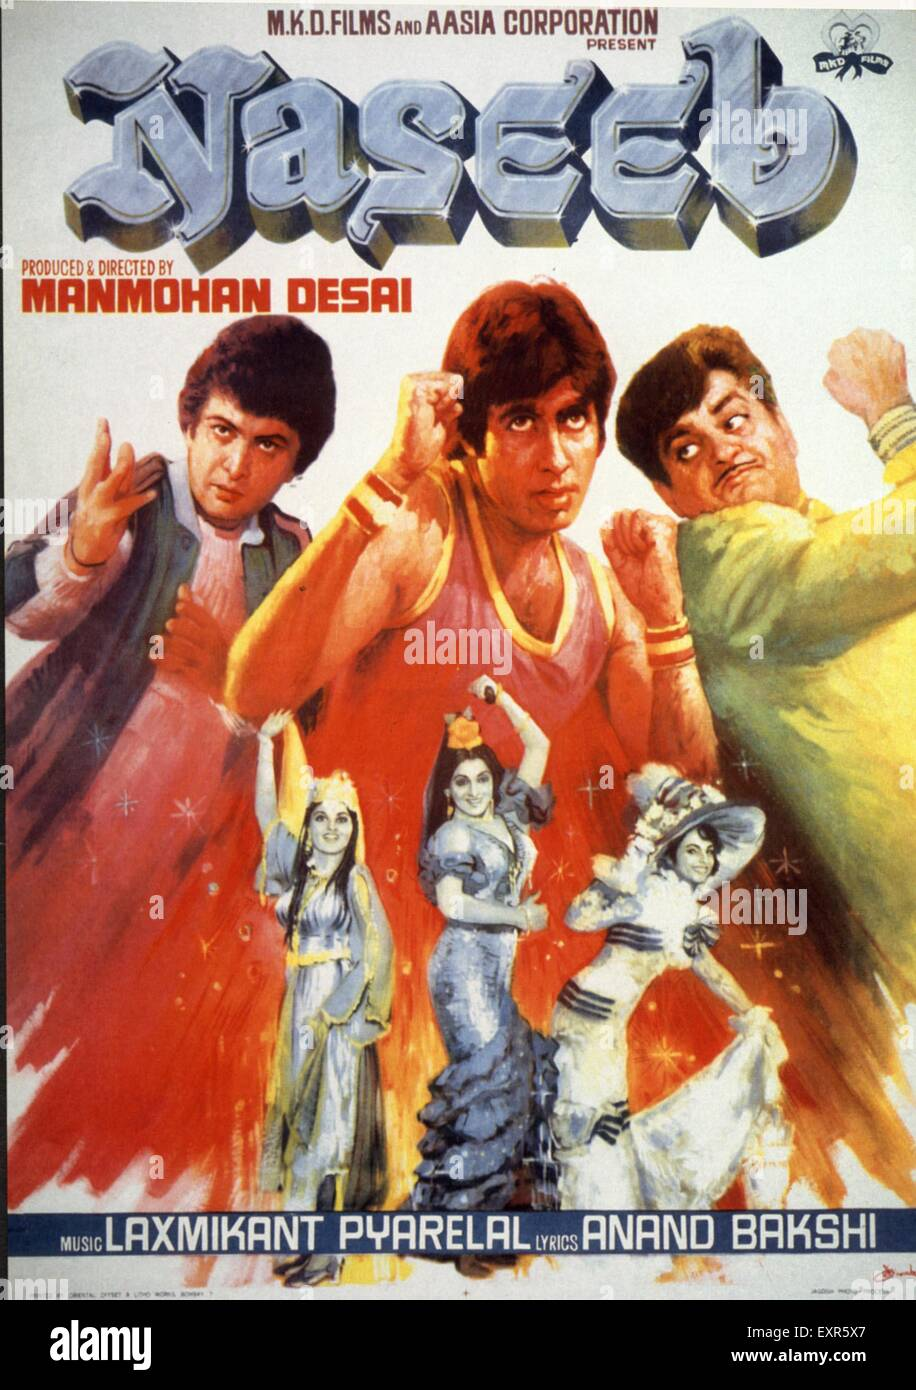 1980s India Naseeb Film Poster - Stock Image